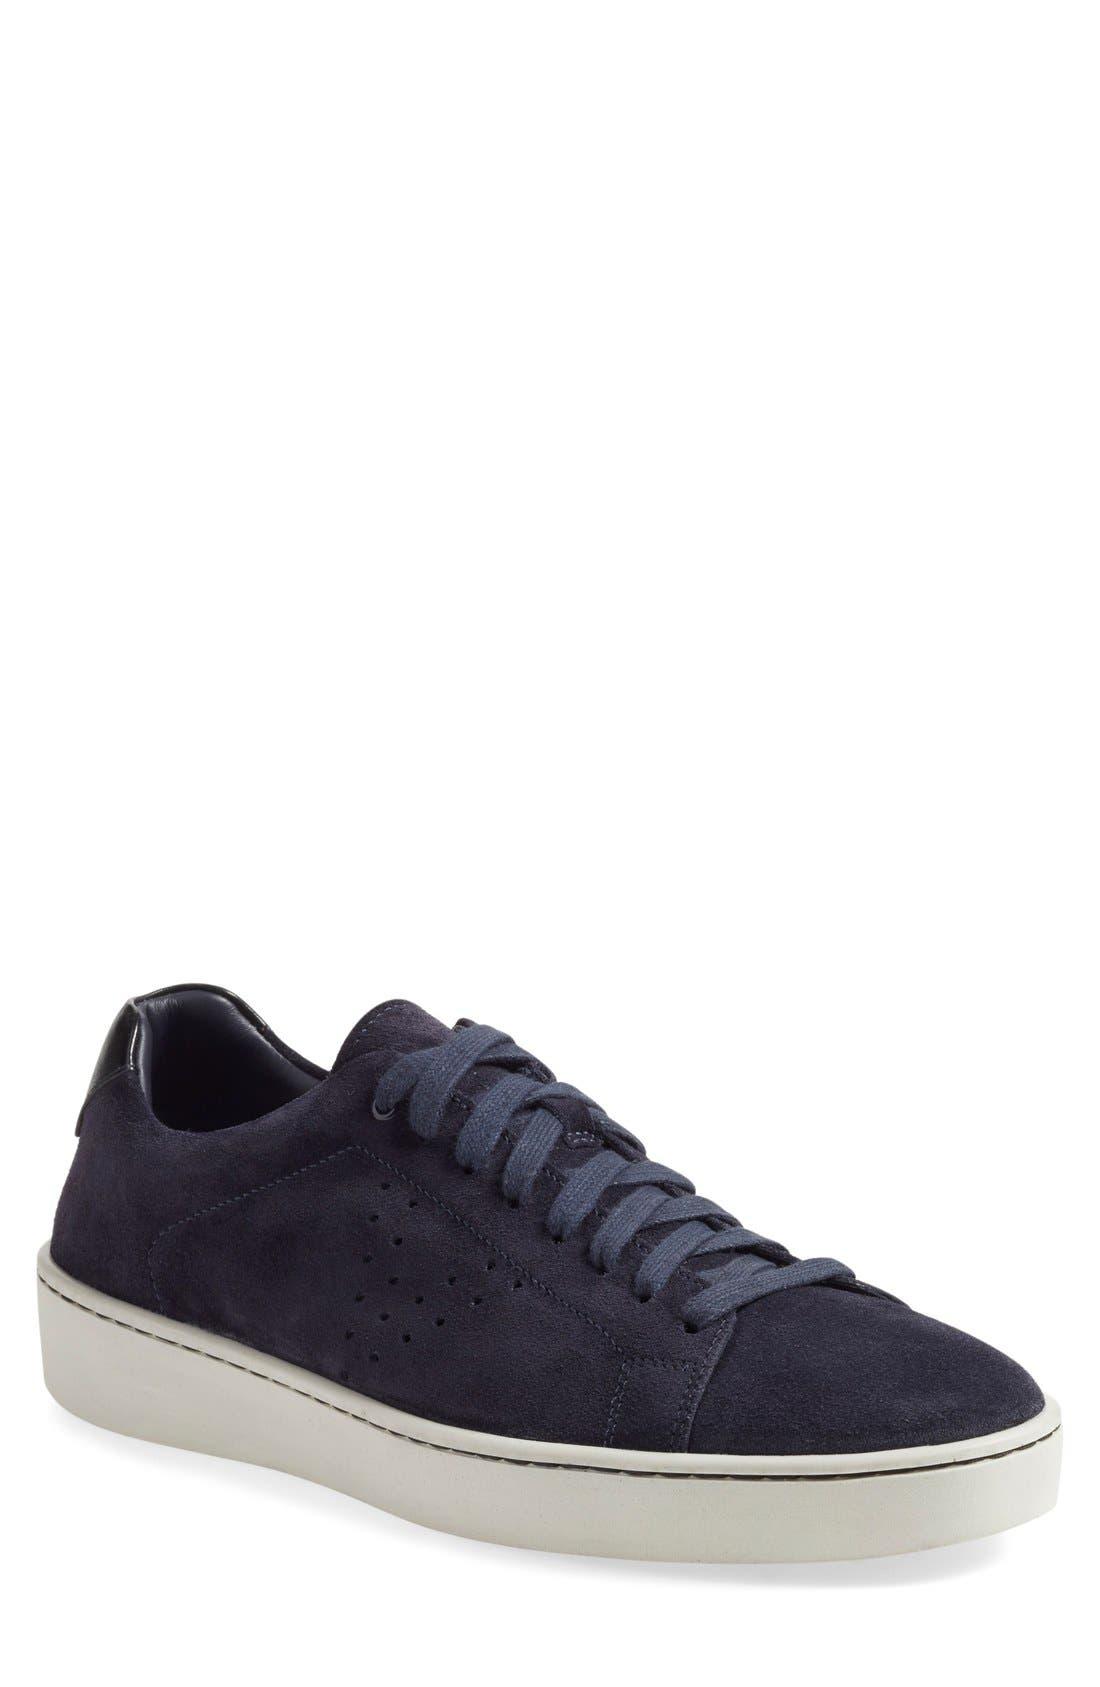 Alternate Image 1 Selected - Vince 'Simon' Perforated Sneaker (Men)